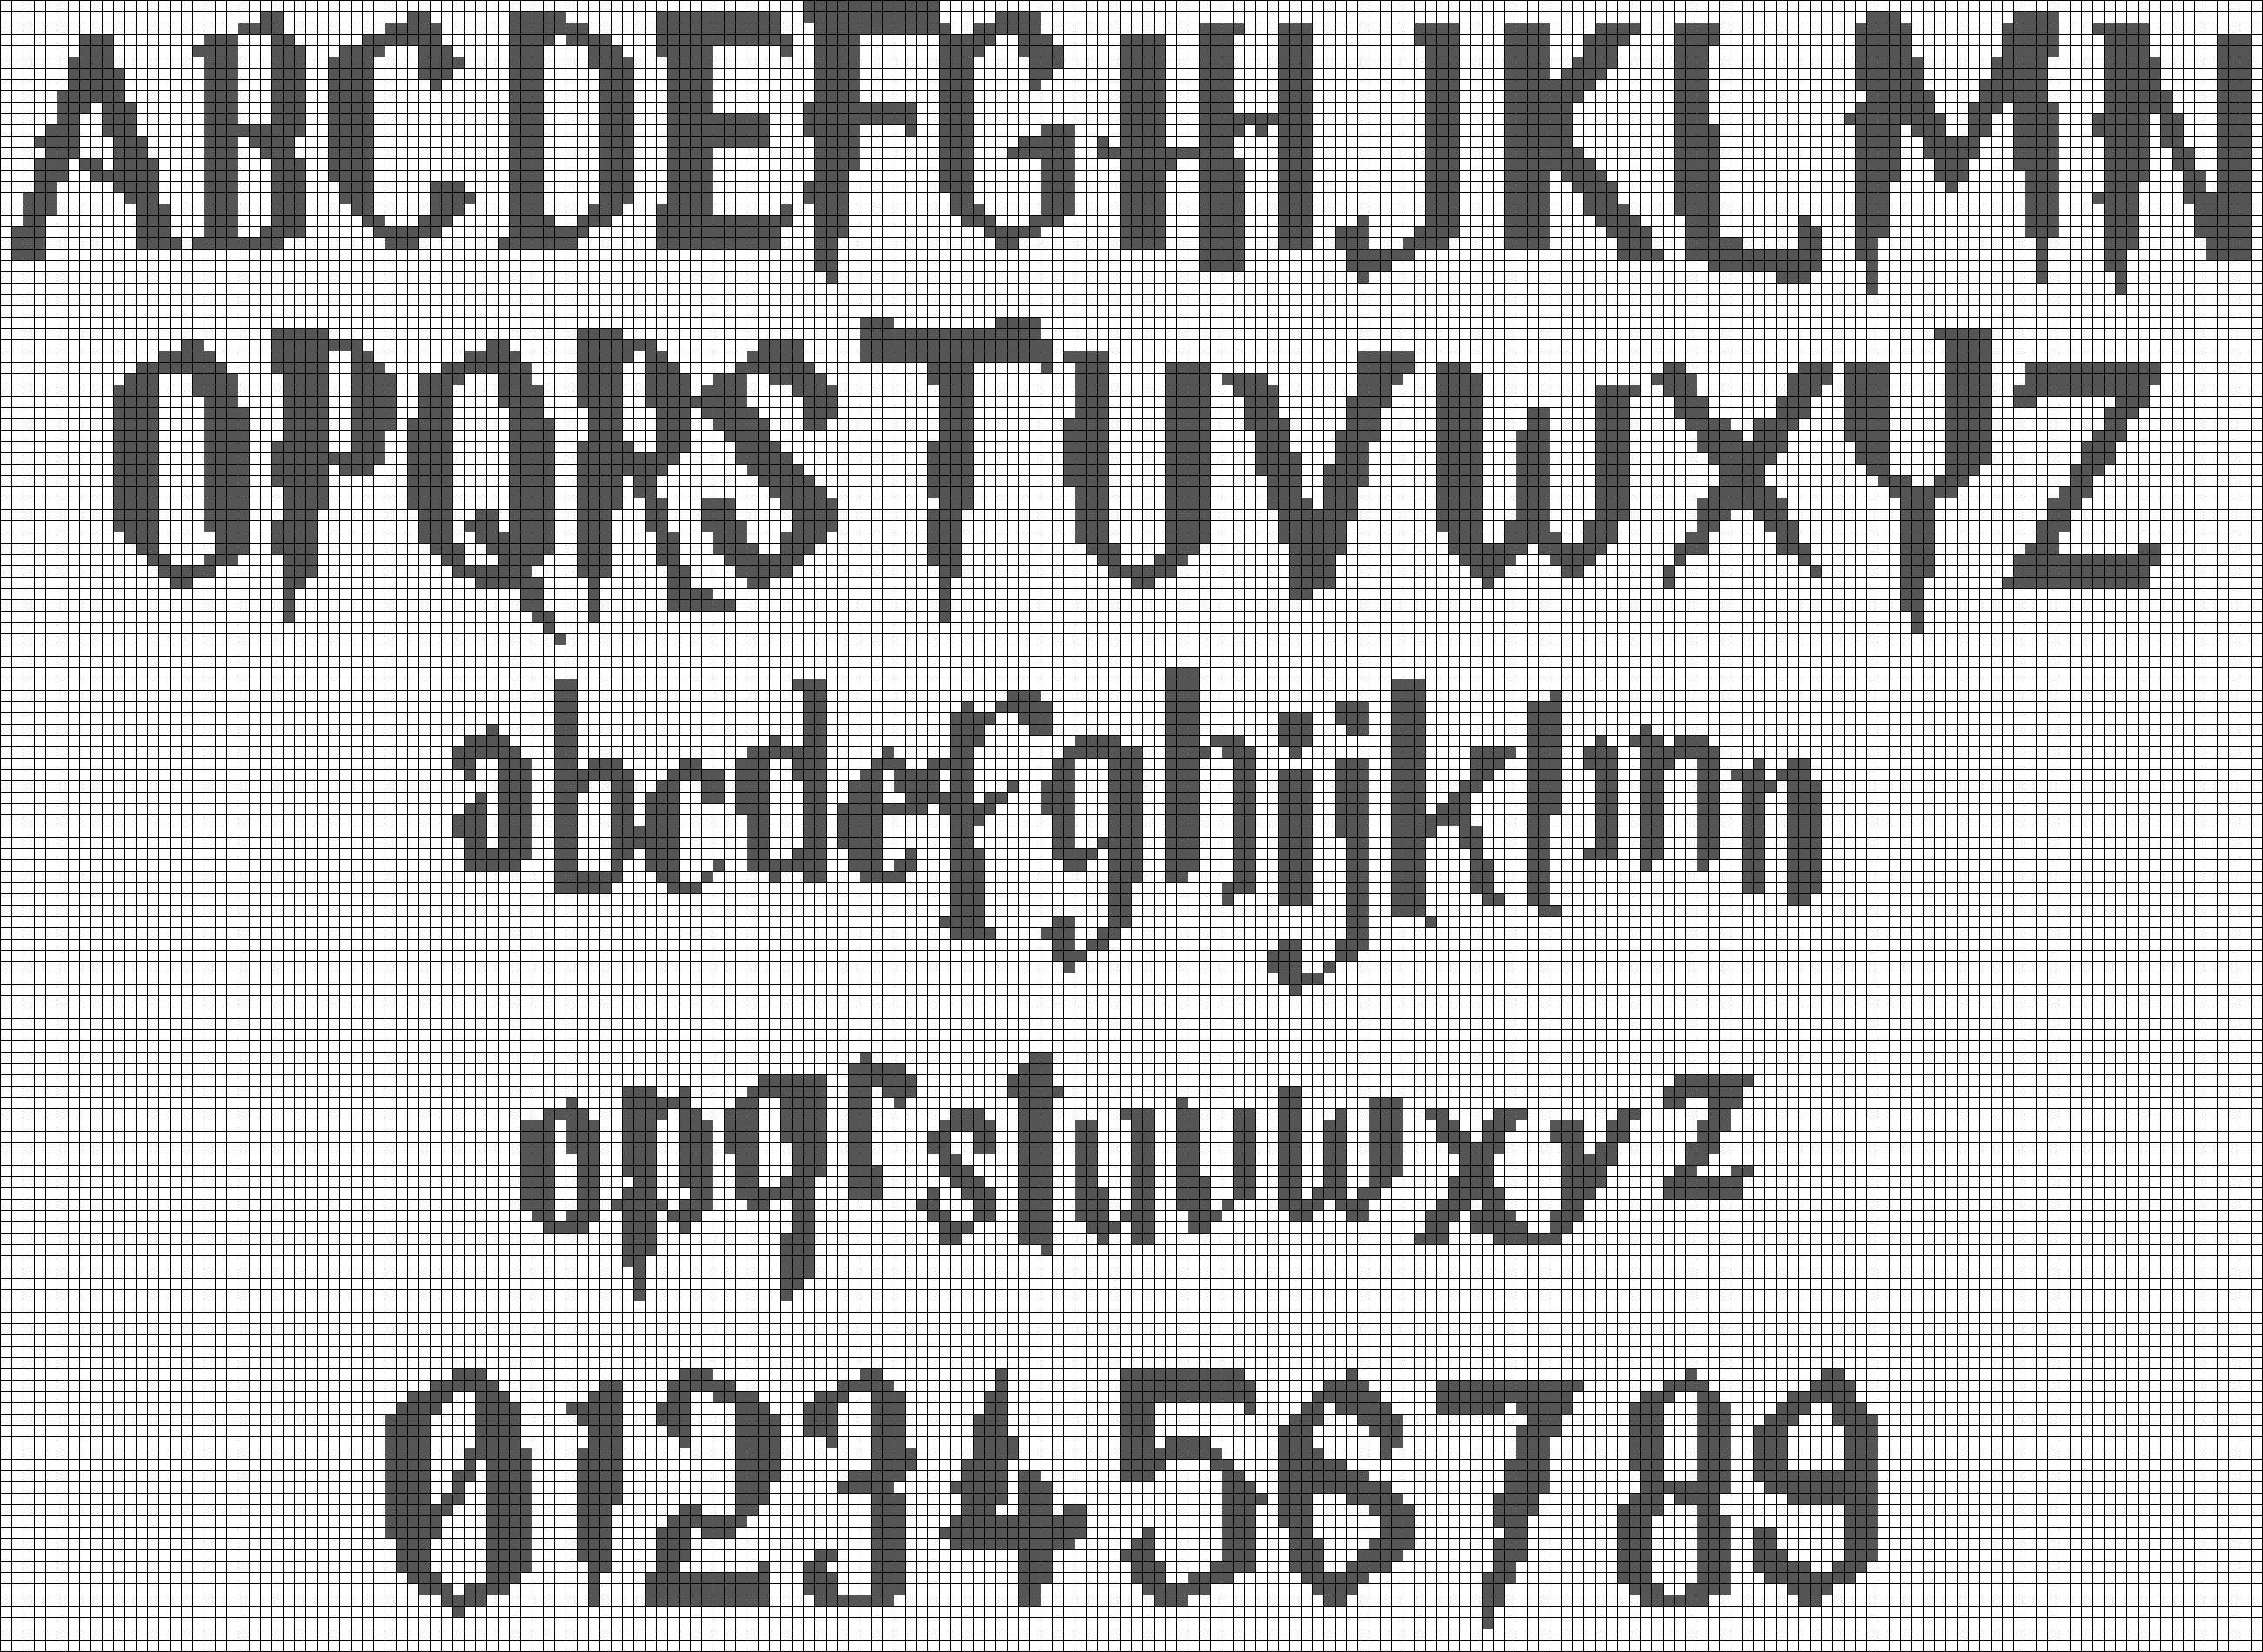 Alpha Friendship Bracelet Pattern 594 Added By Admin Font Letter Lette Cross Stitch Alphabet Patterns Simple Cross Stitch Harry Potter Cross Stitch Pattern